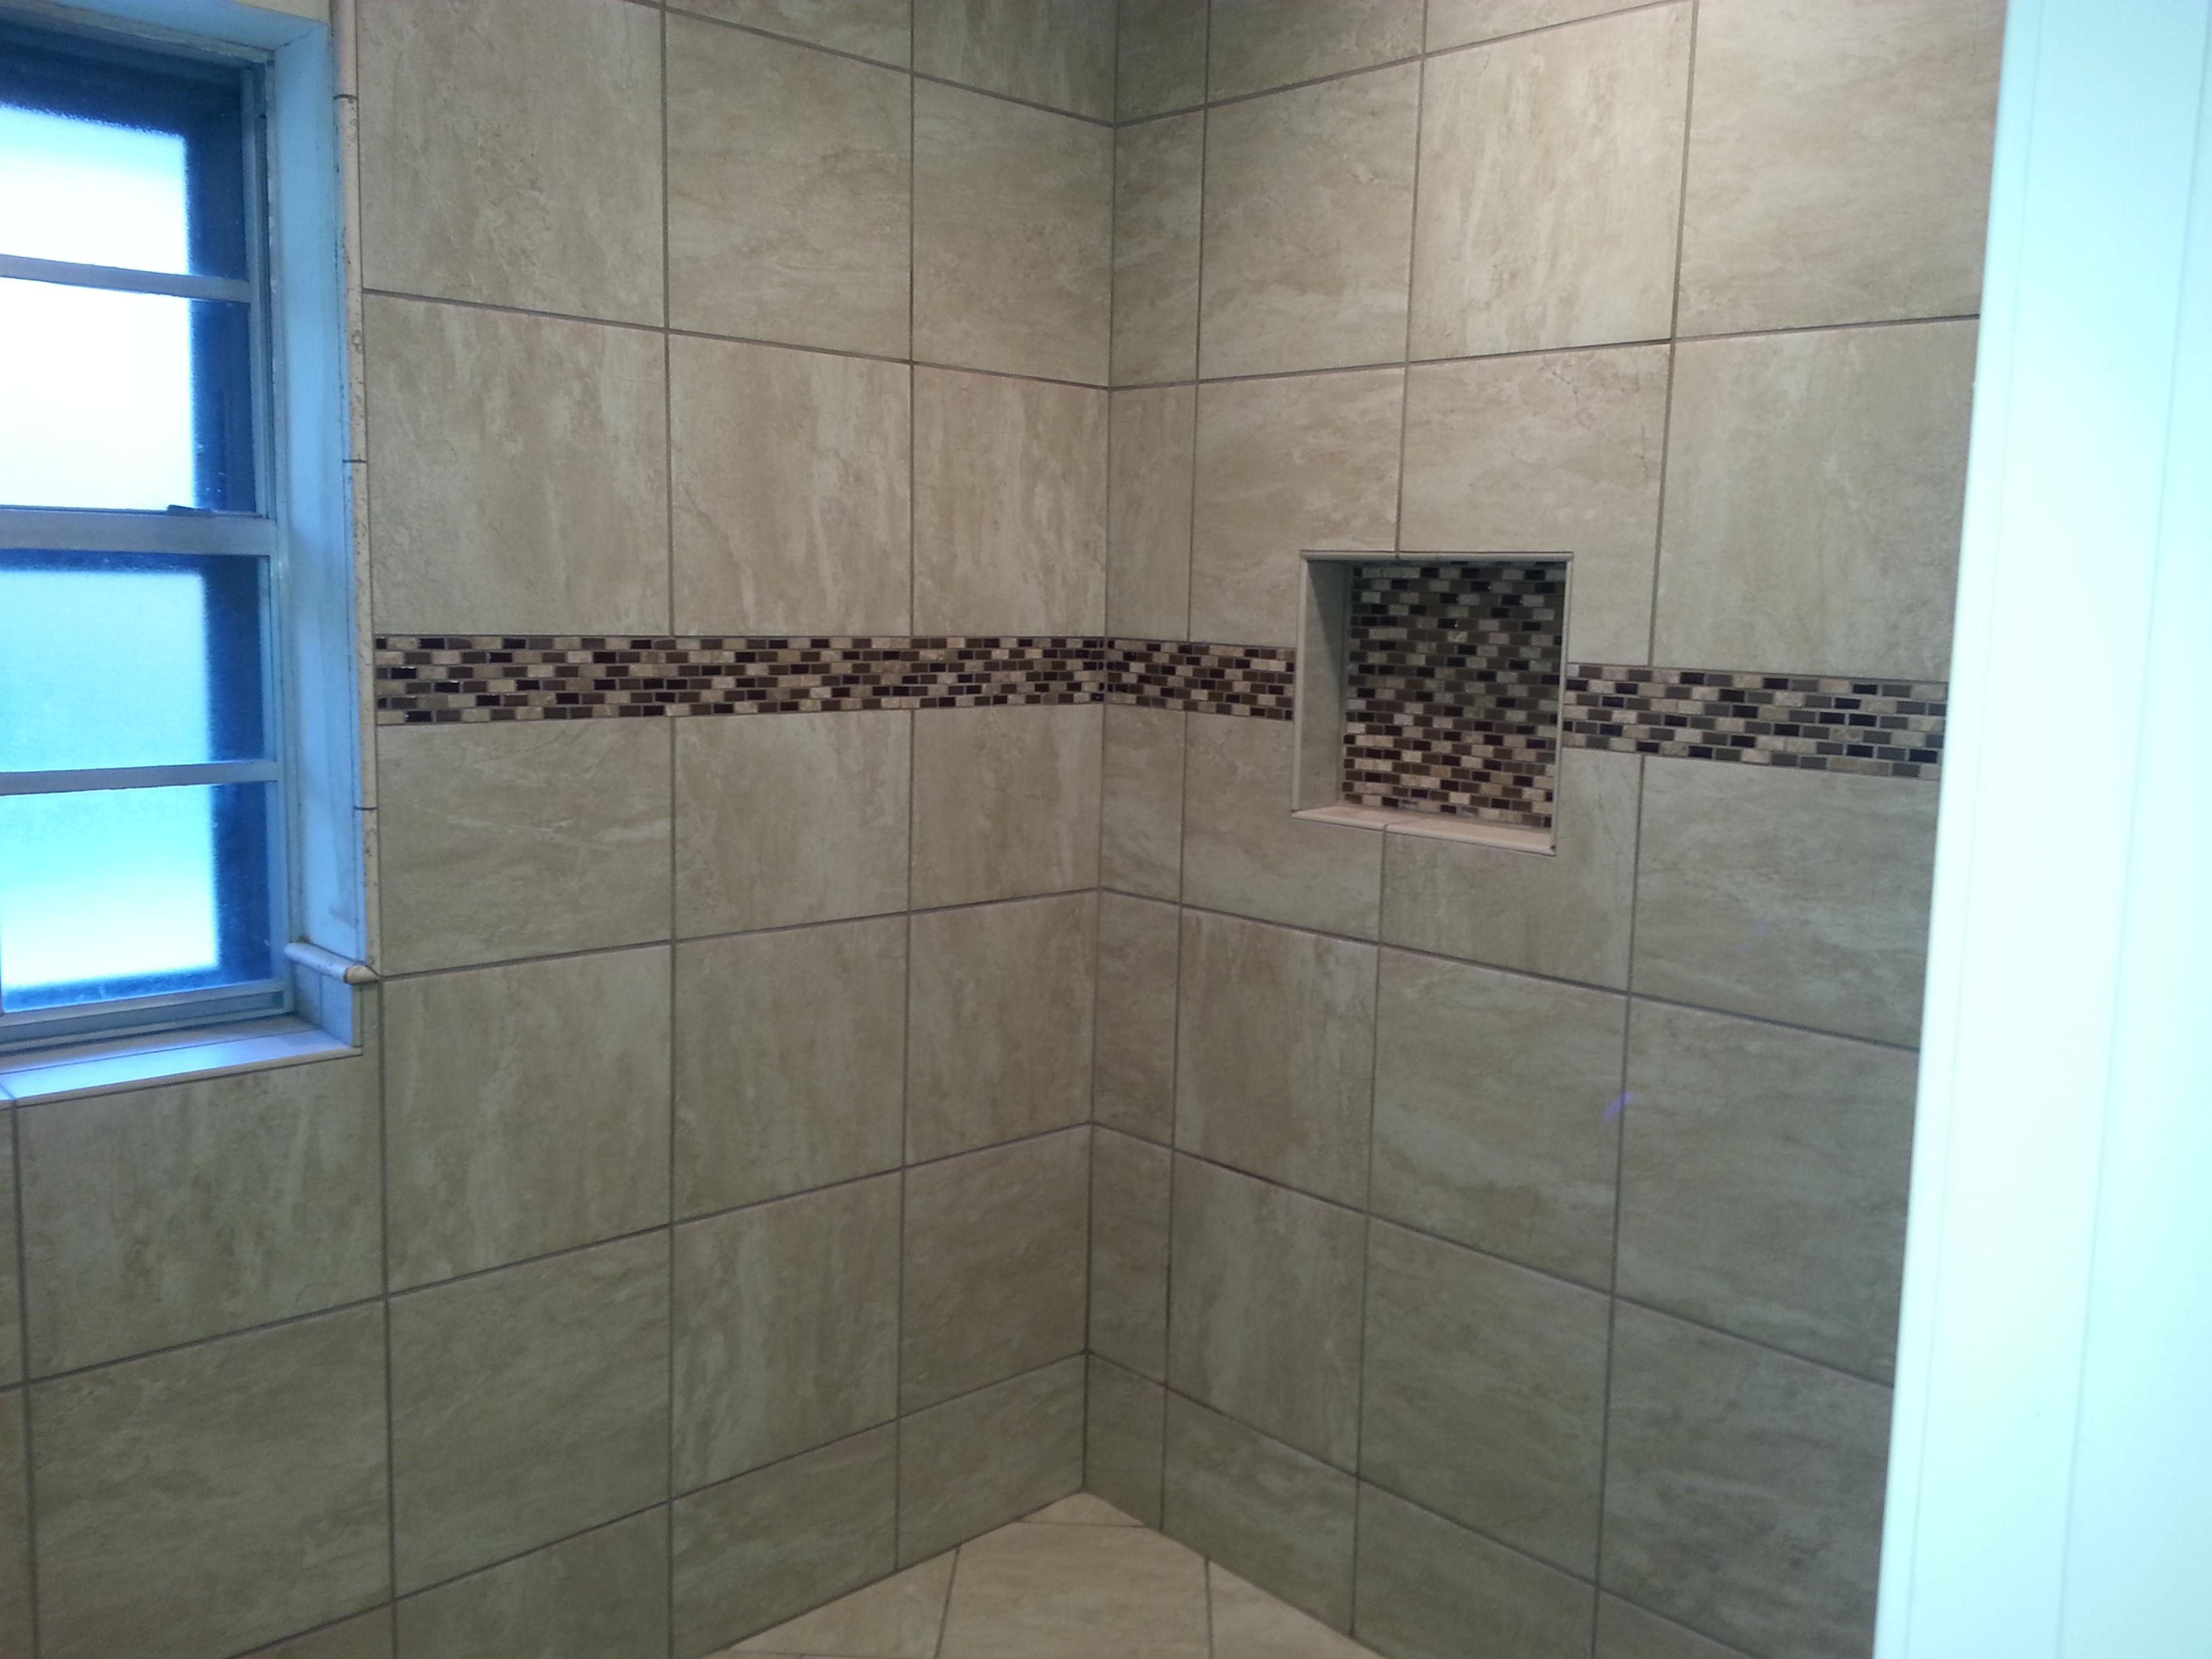 Gallery for Interactive bathroom